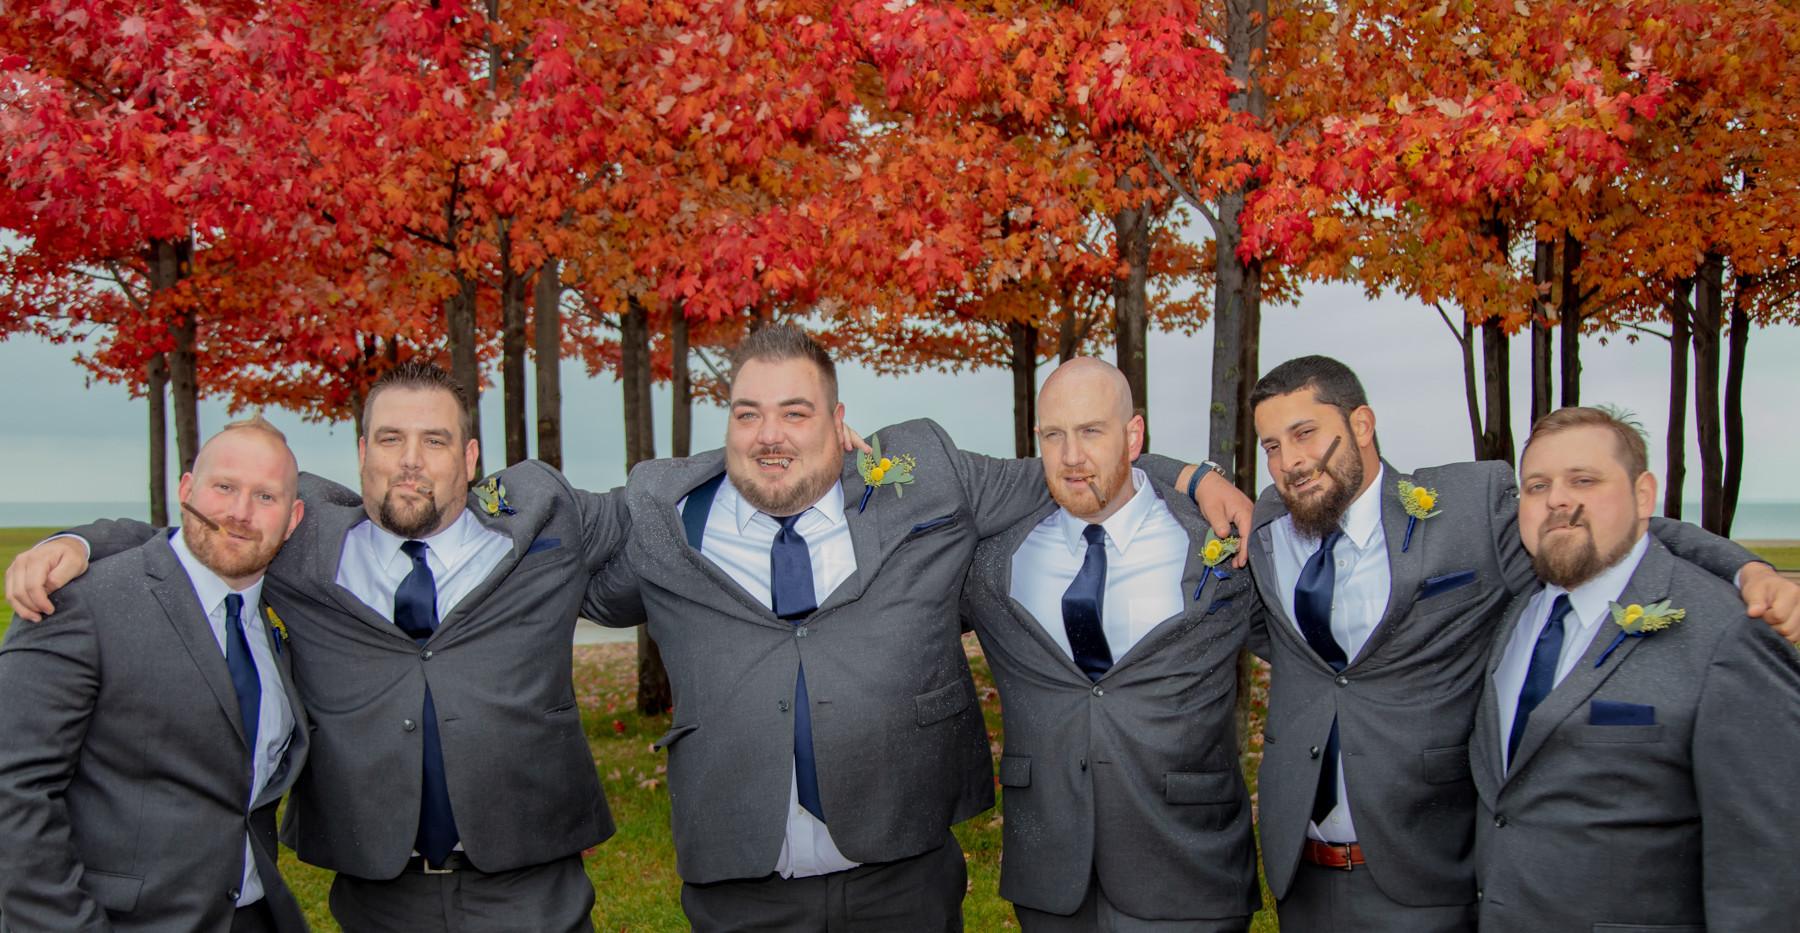 T+T Wedding - 1z3a5992.jpg